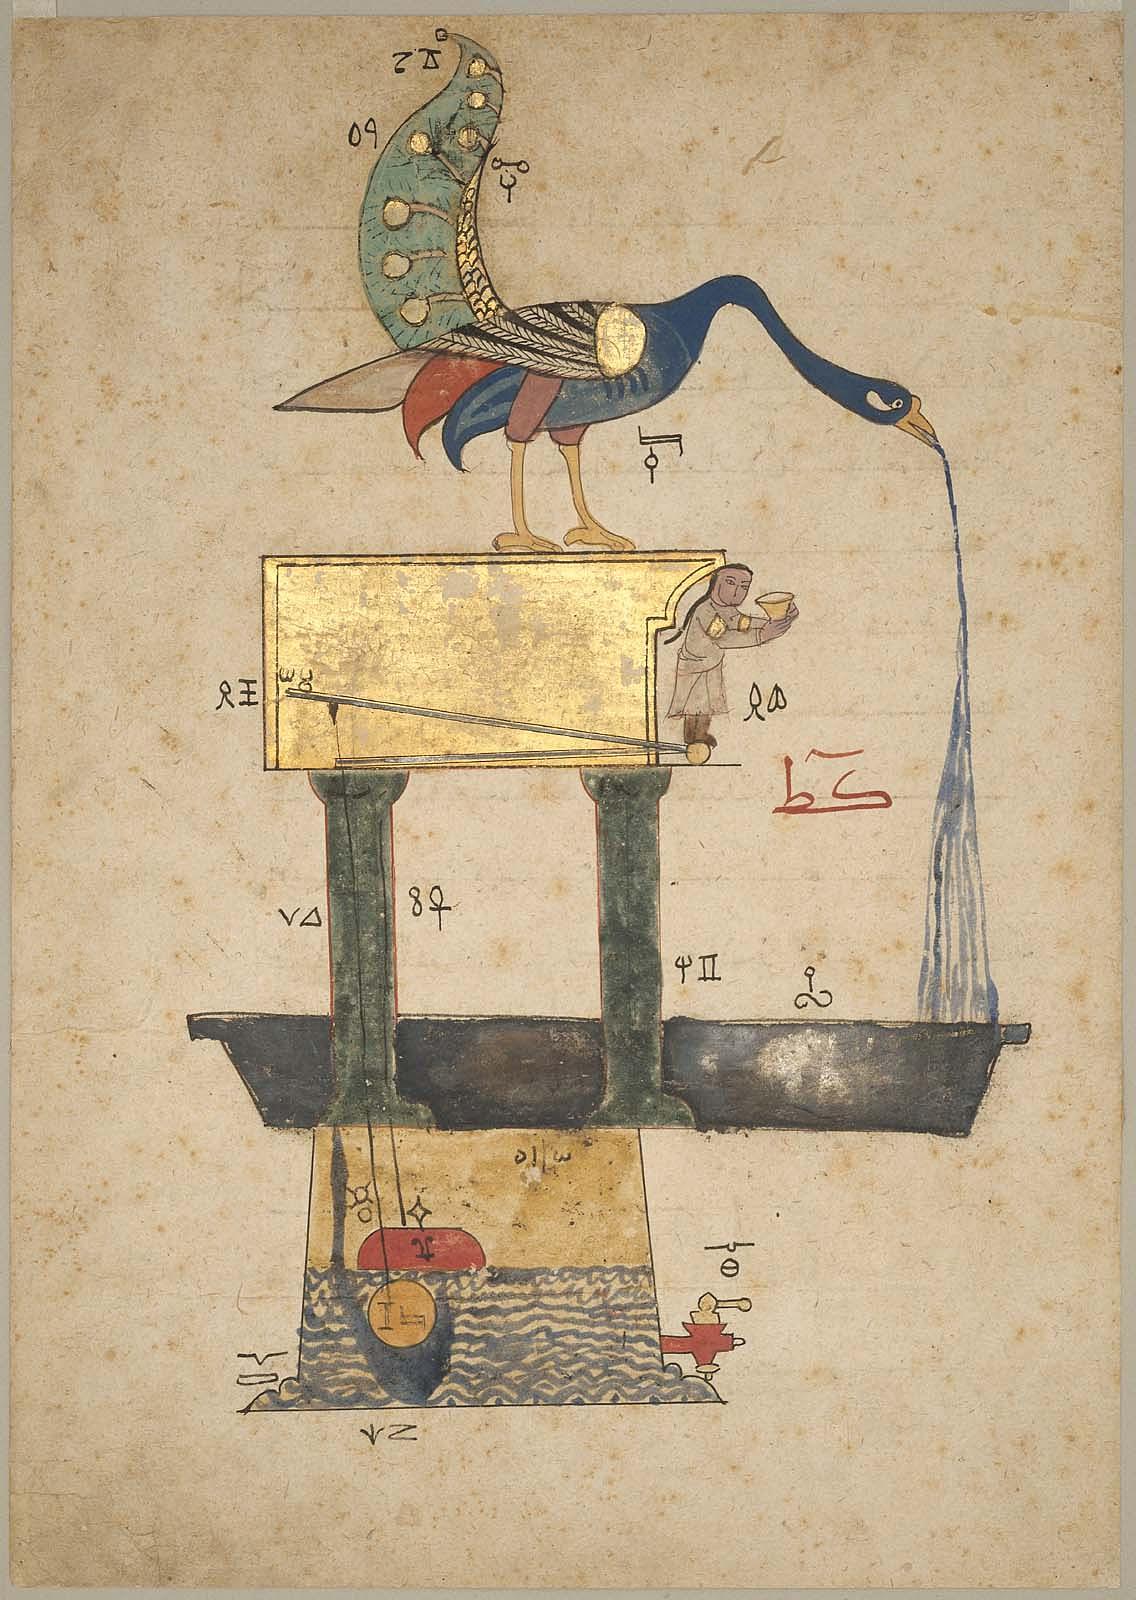 al-jazari-paon-fontaine-bassin-automate